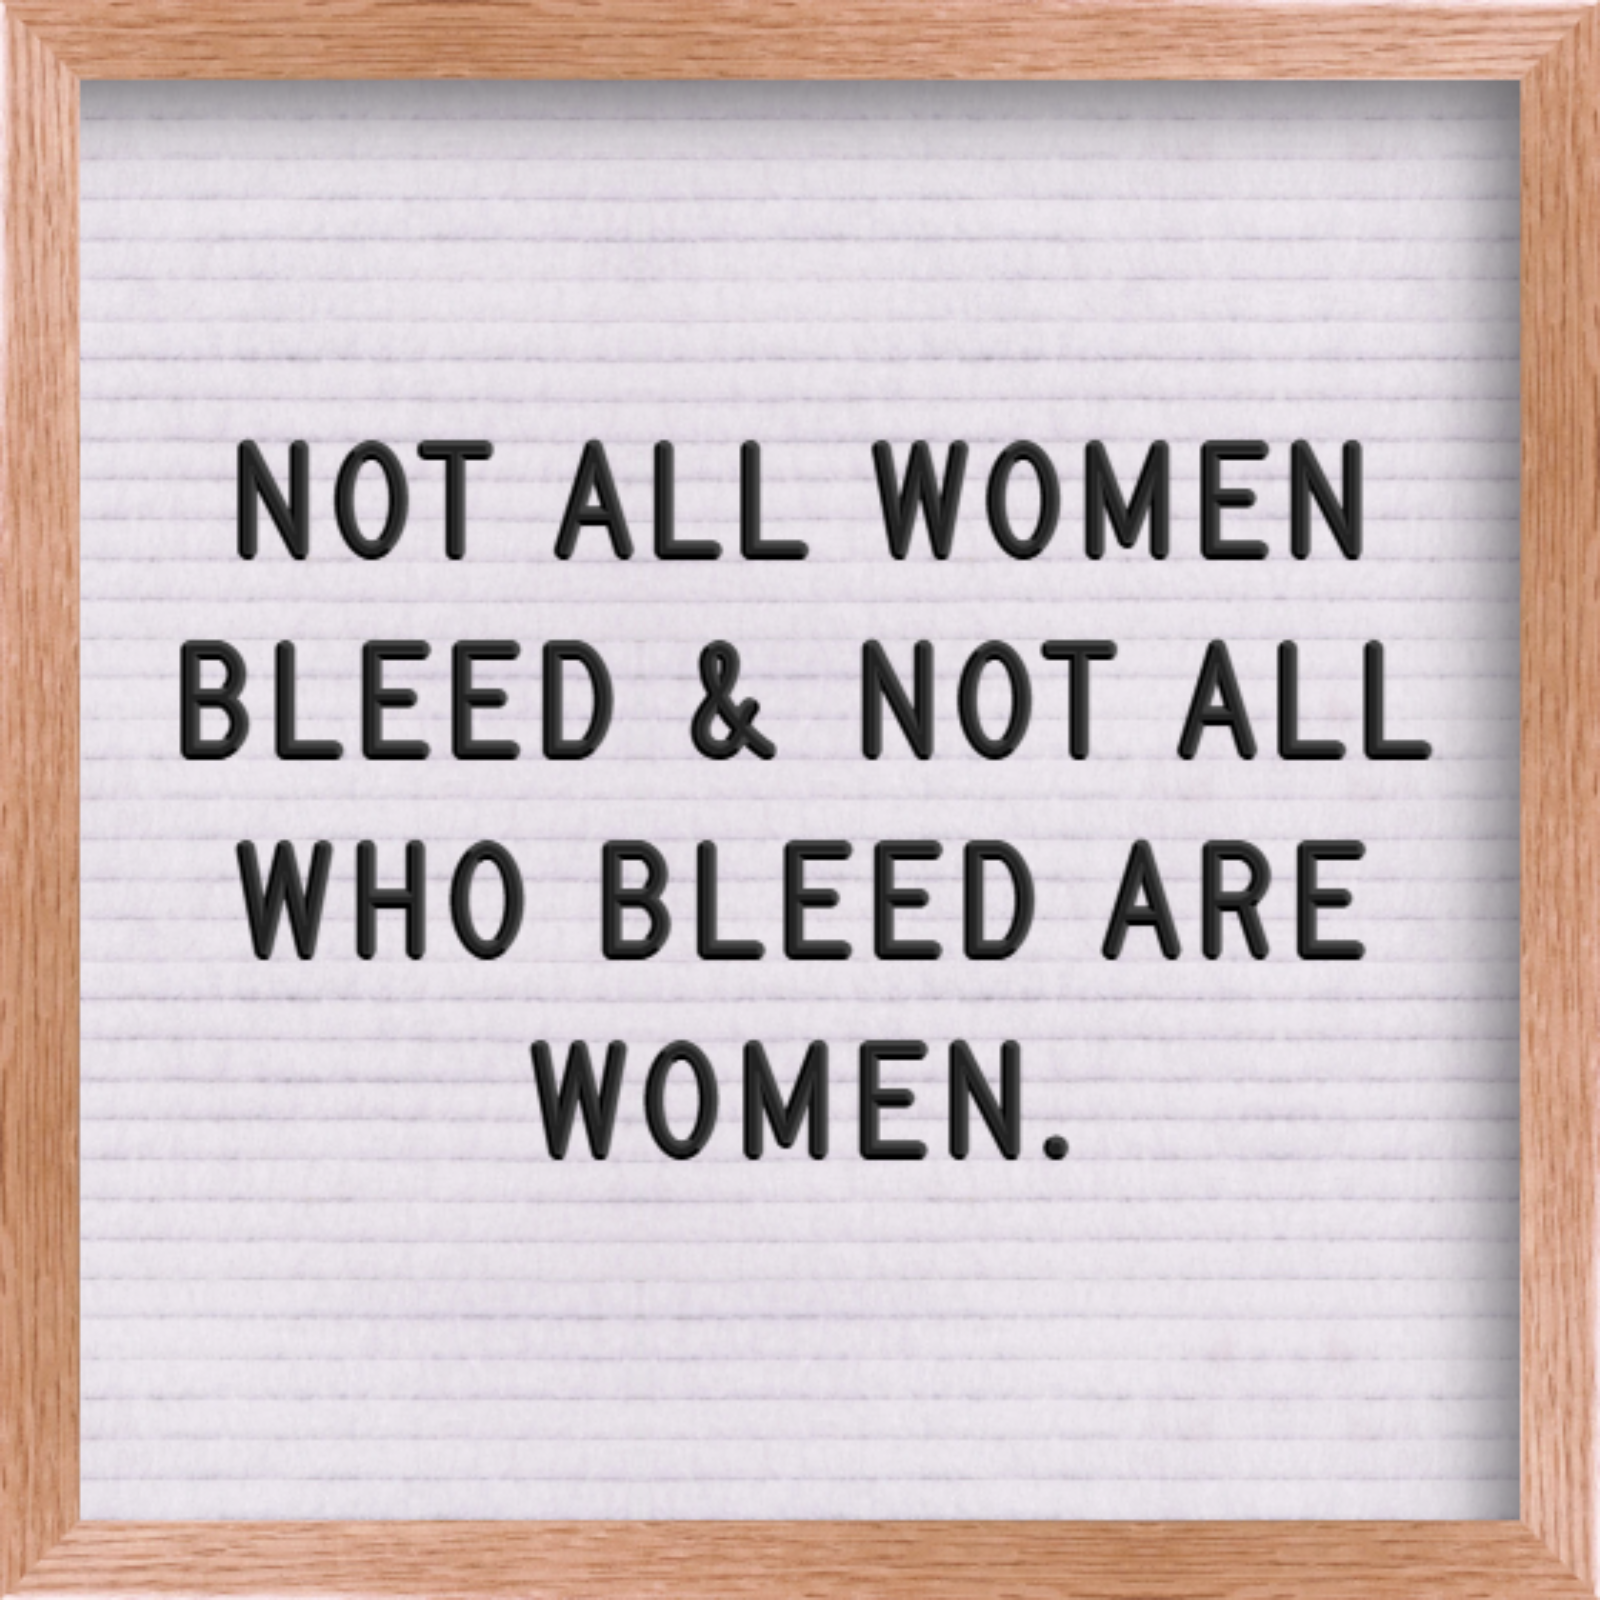 Menstruation: Why Gender Inclusive Language Matters